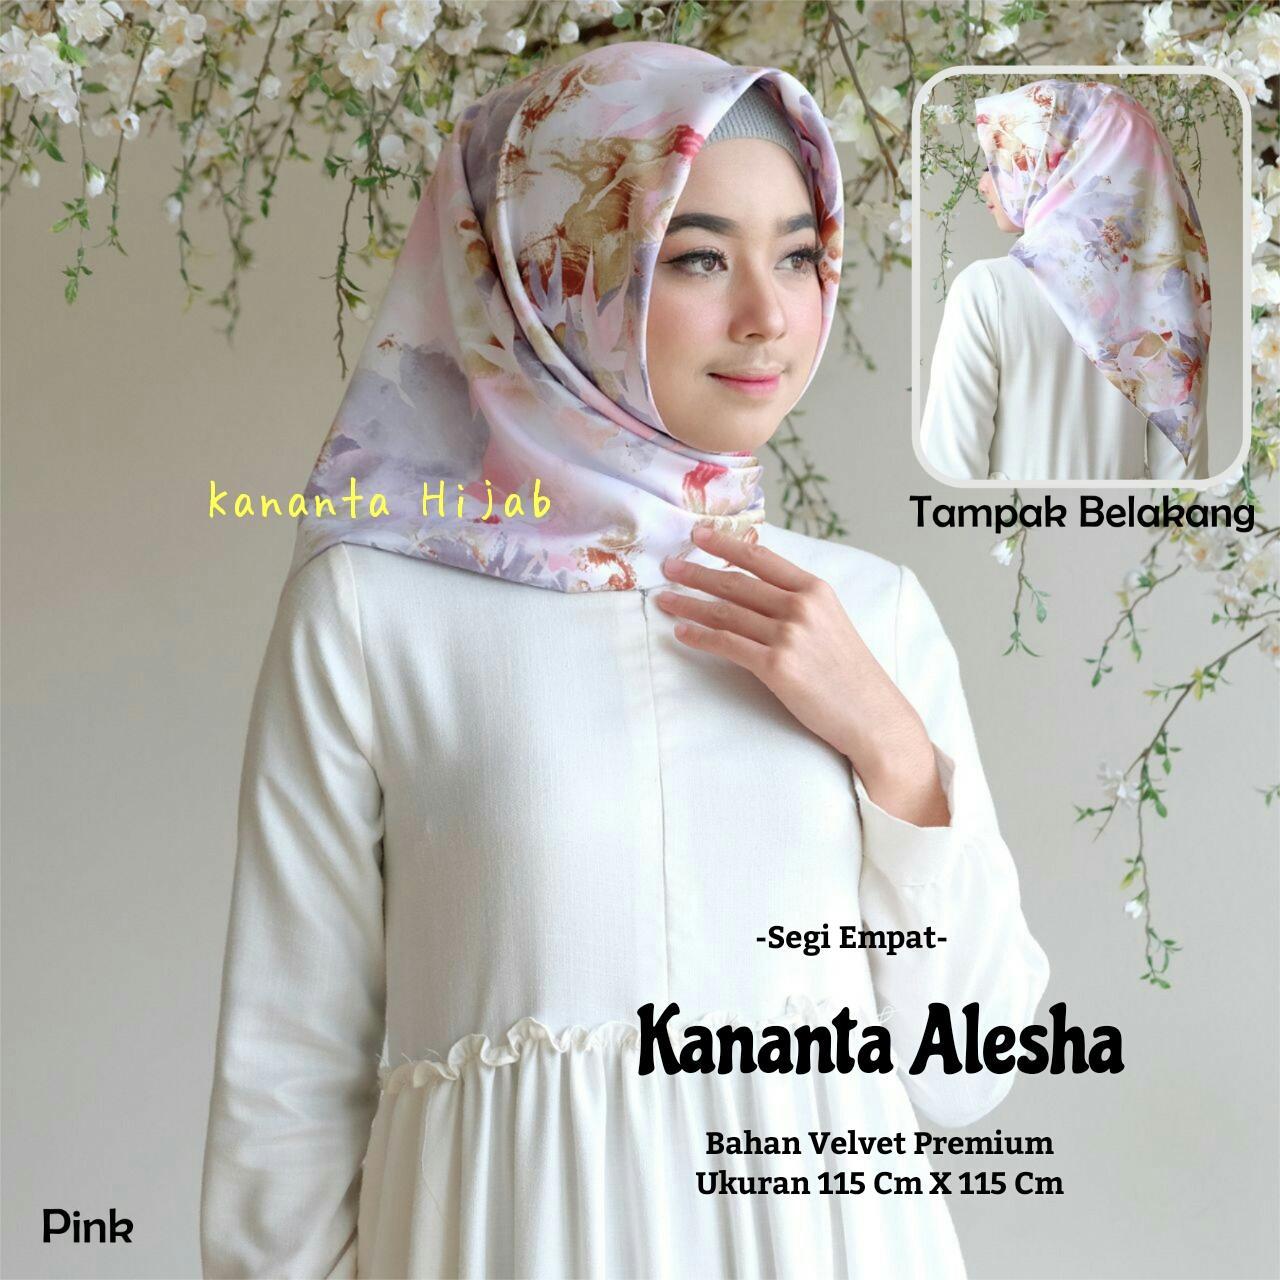 Hijab Segi Empat Motif Bunga Bahan Velvet Premium Kananta ALESHA